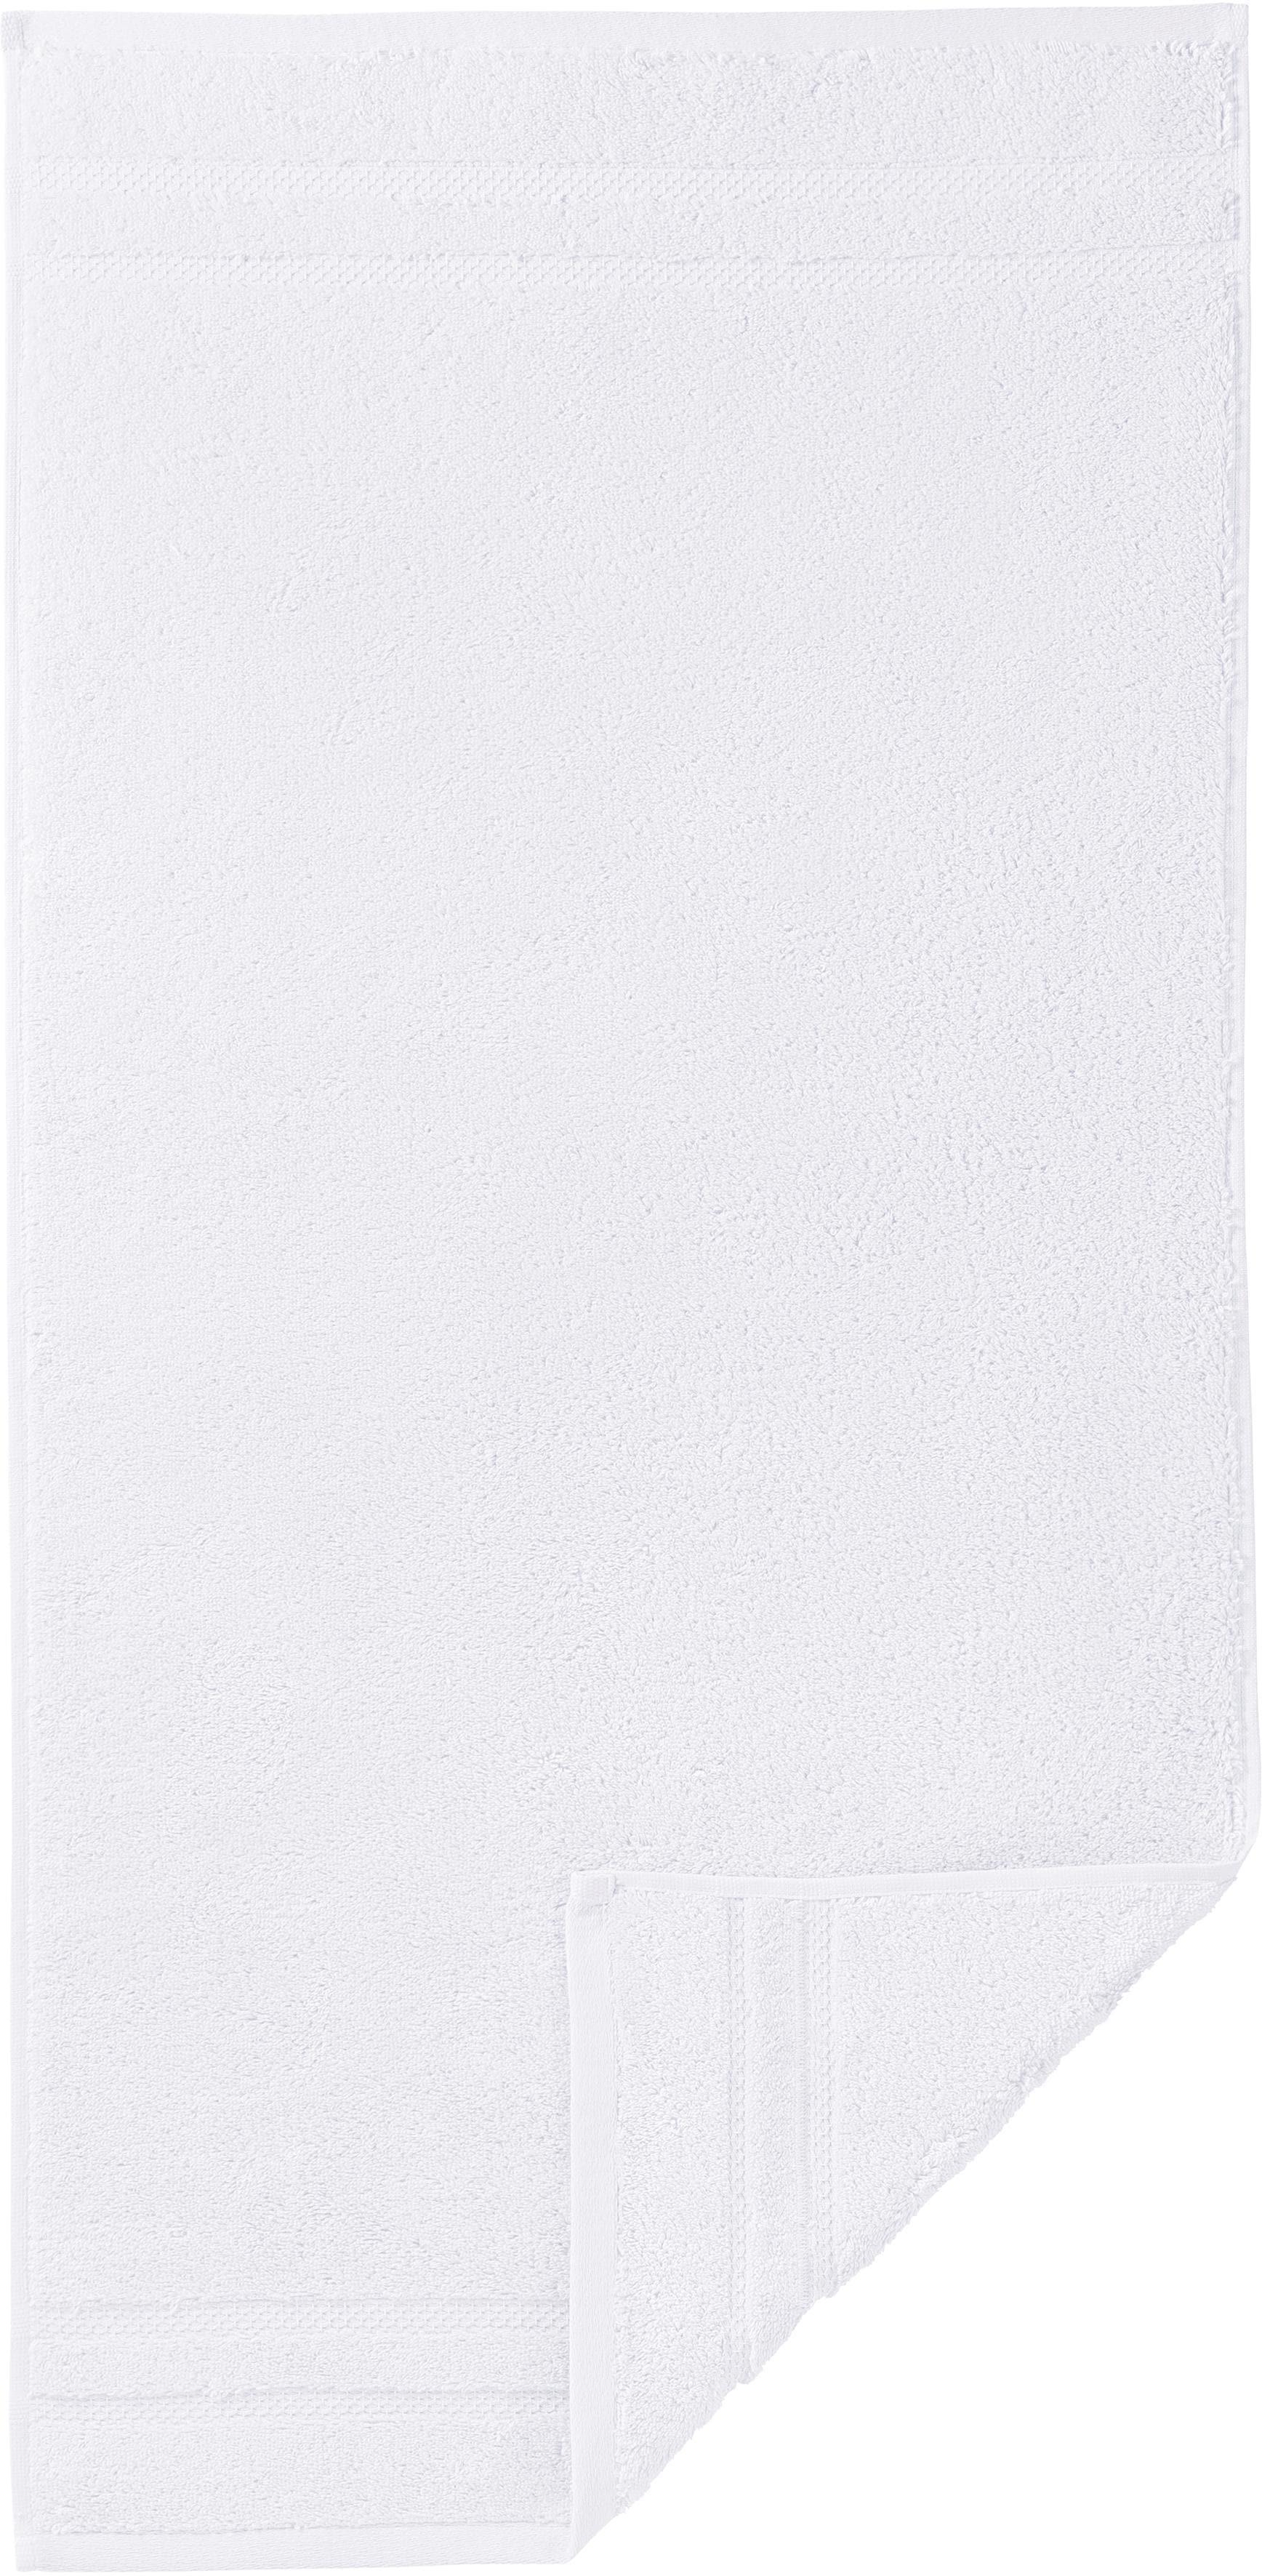 Badetuch Micro Touch Egeria | Bad > Handtücher > Badetücher | Weiß | Egeria